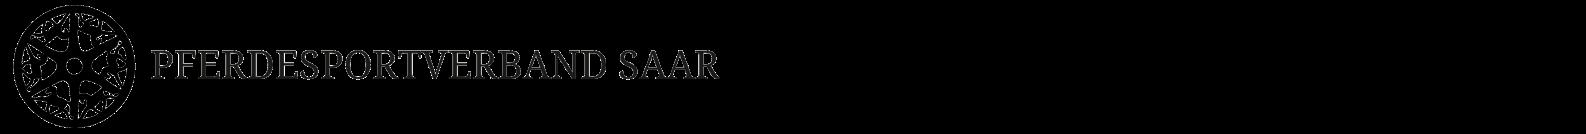 Pferdesportverband-Saarland Logo